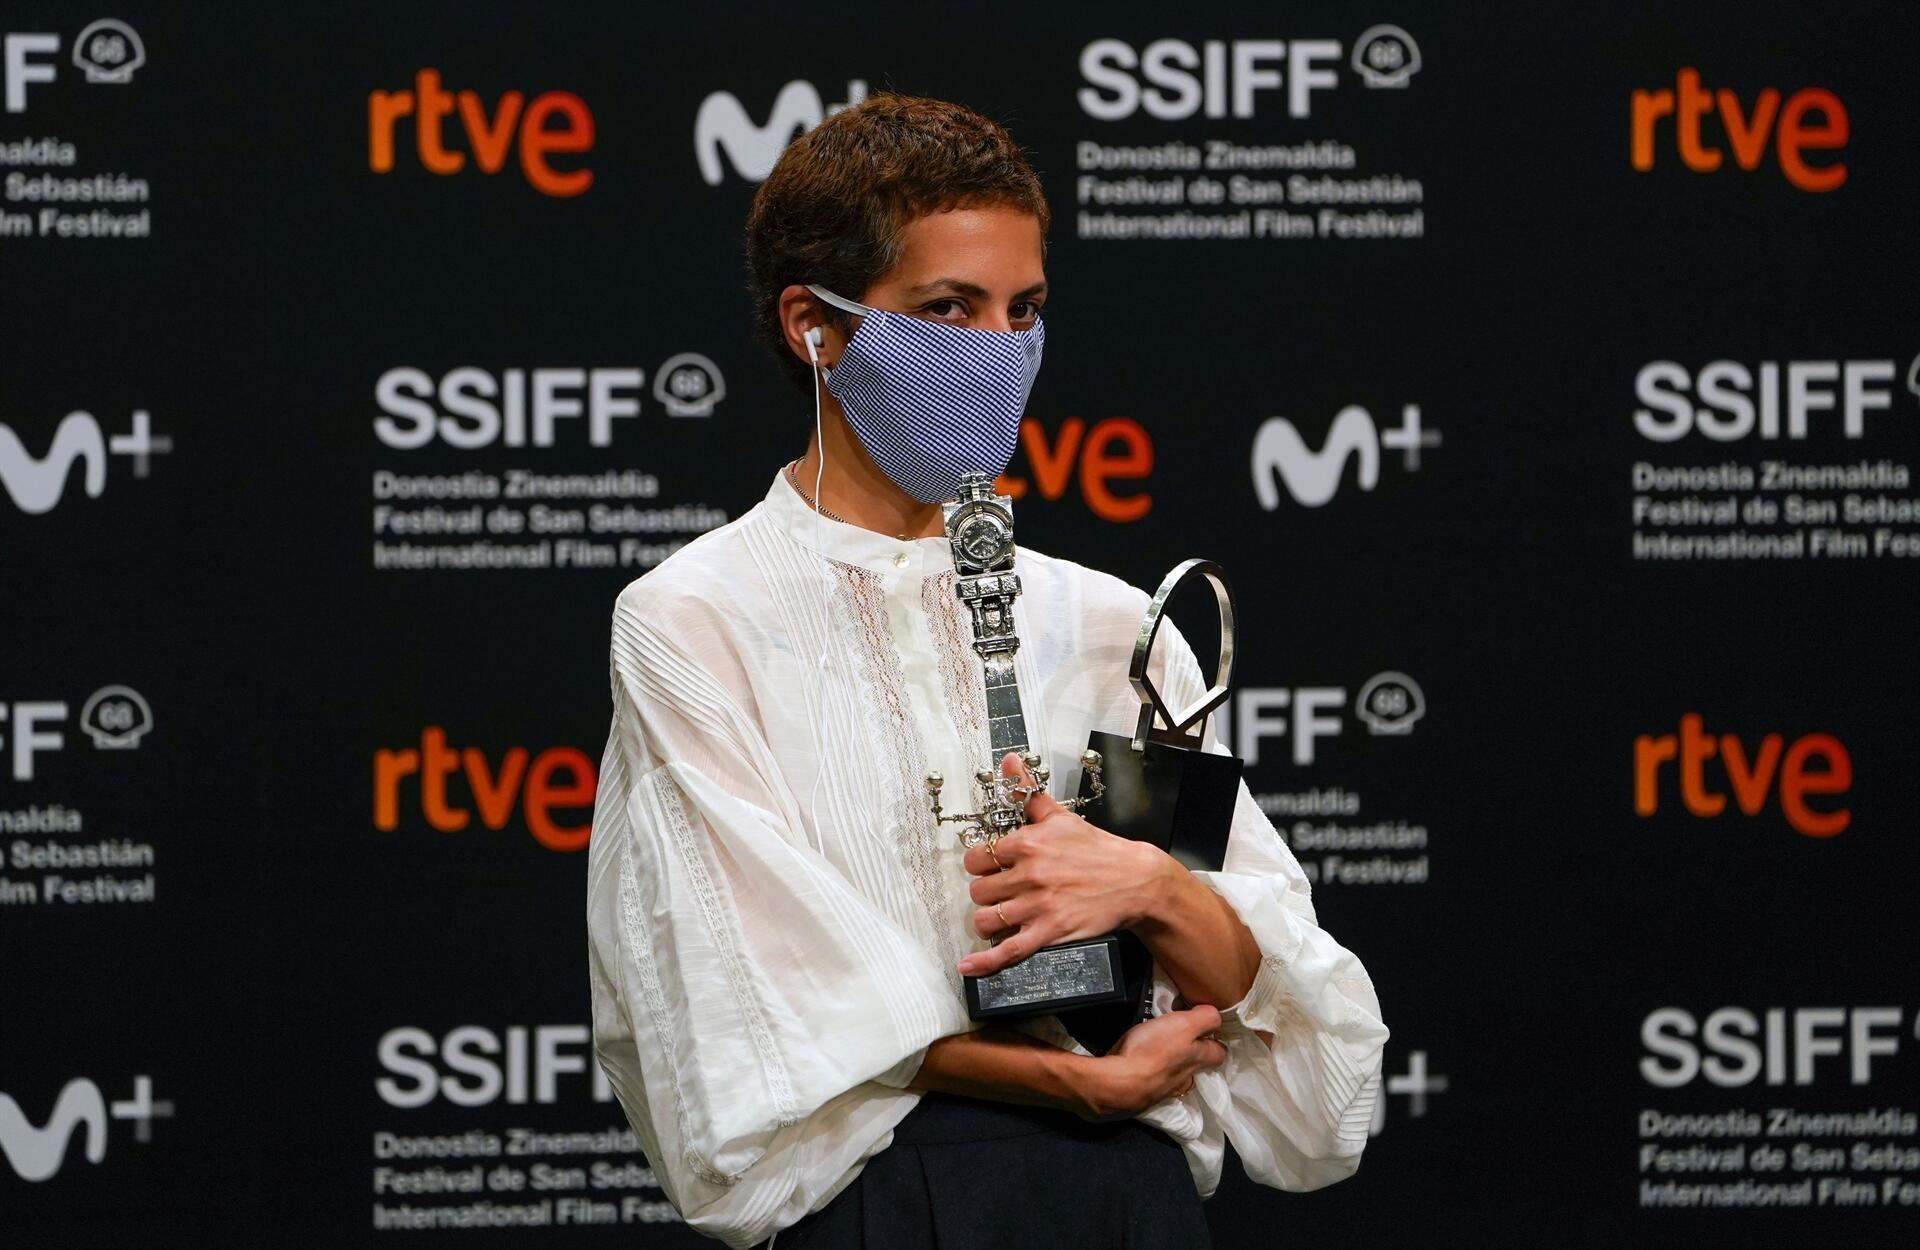 San Sebastian Film Festival Announces Award Winners